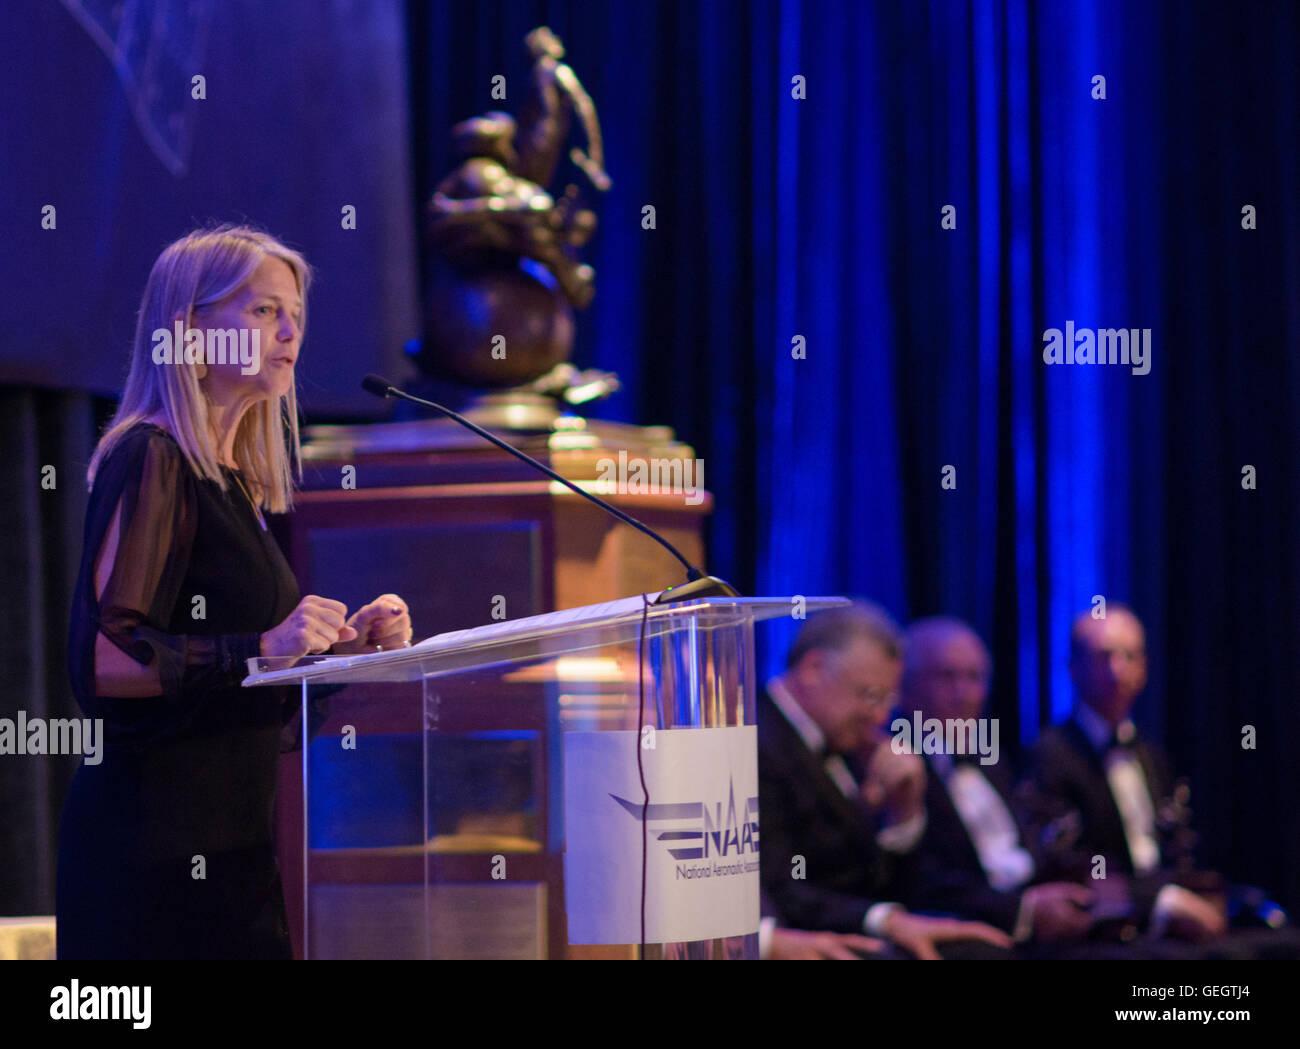 2015 Collier Trophy Presentation  06090004 - Stock Image